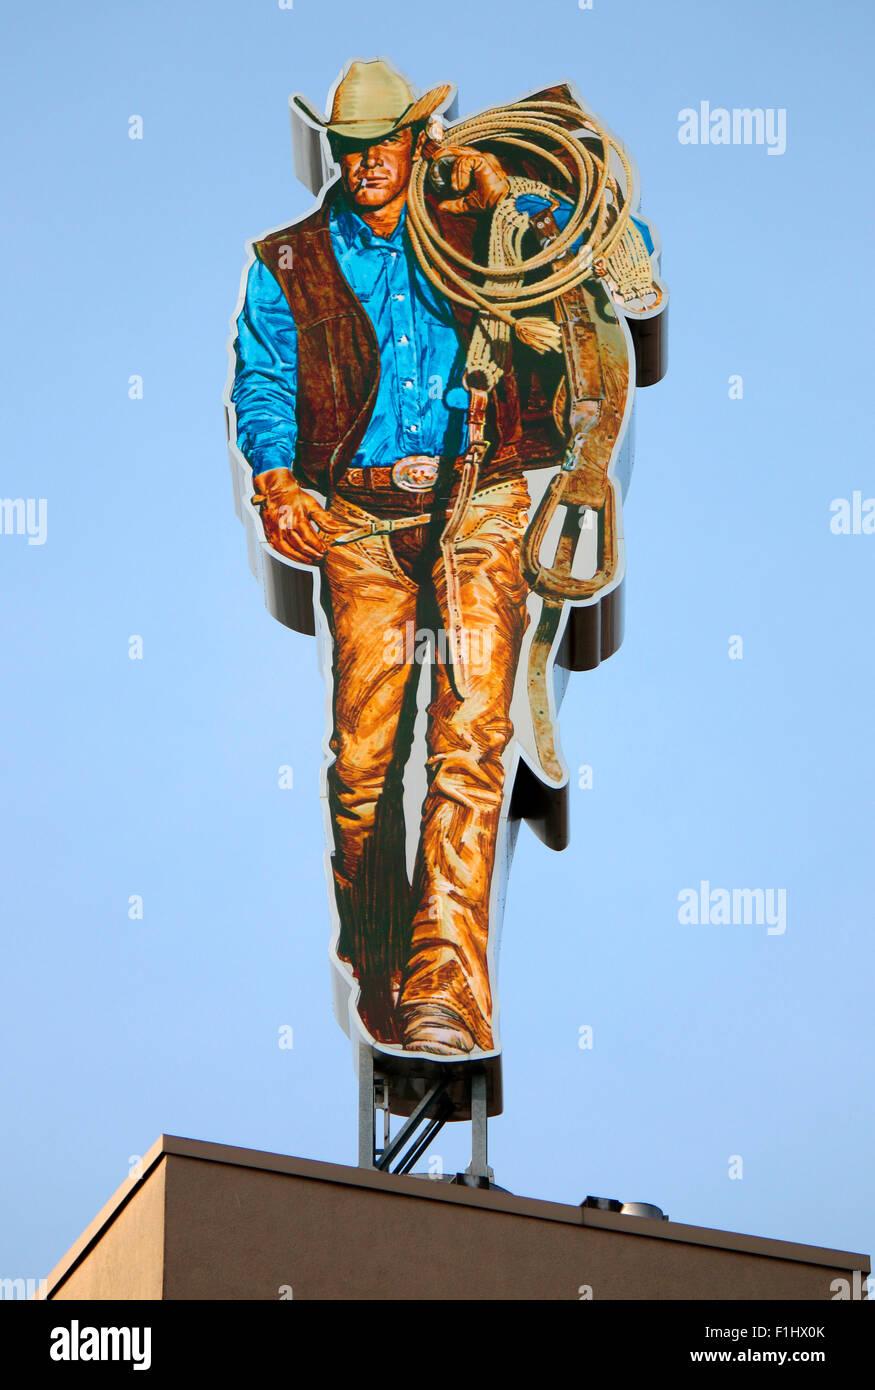 Werbung fur 'Marlboro' mit dem 'Marlboro Mann', Berlin. - Stock Image